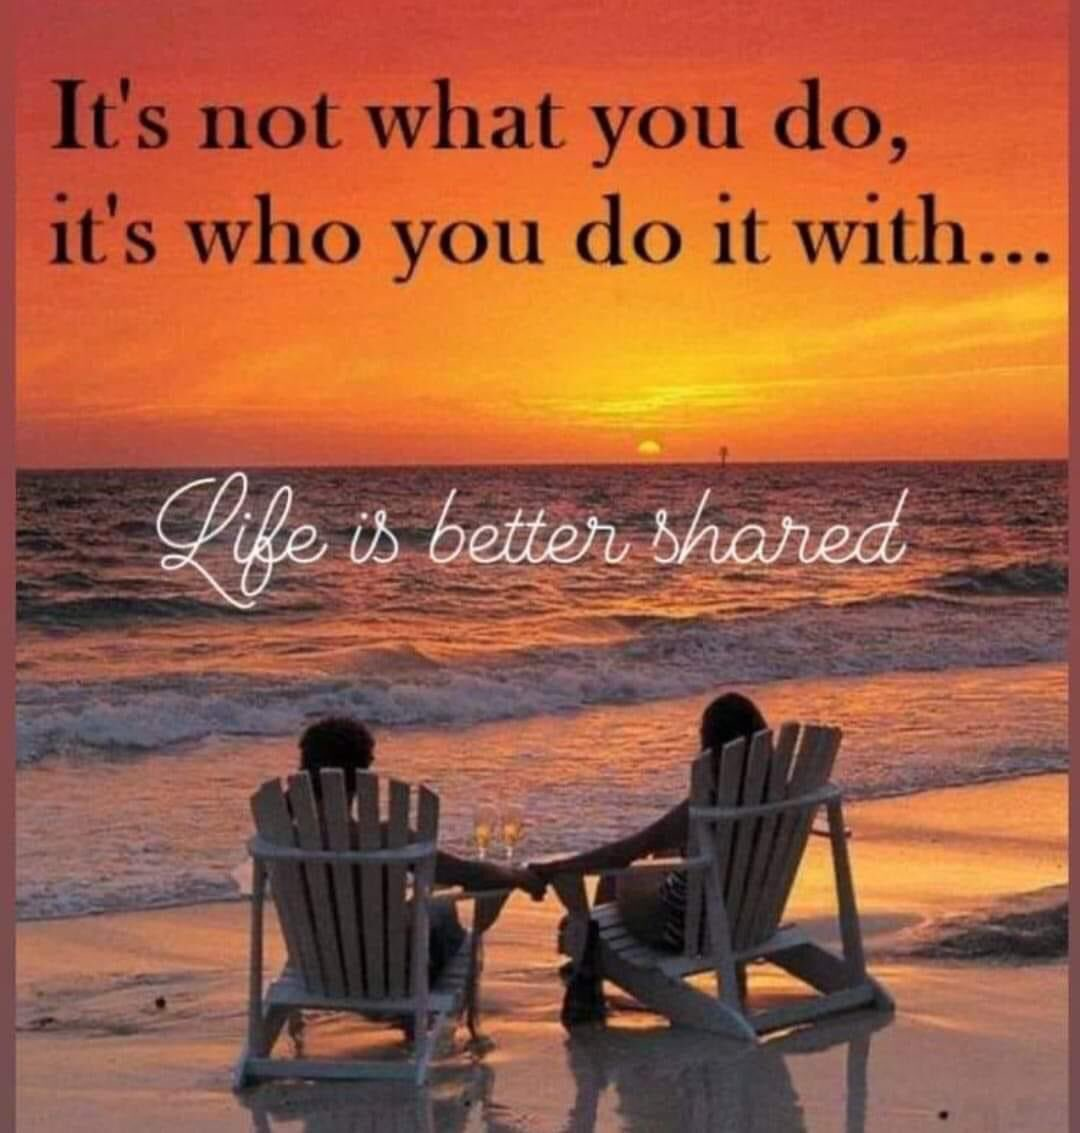 #LifeLessons #WordsOfWisdom #Share #life with someone #special !!!! #couplegoals #BetterTogether #believeinlove ♥️ #LoveIsEssential #lifeisgood #LIG #positive #lifestyle #commitment 👉🏽 #love! #thursdayvibes #FridayFeeling #SaturdayMorning #sundayvibes #MondayMotivaton